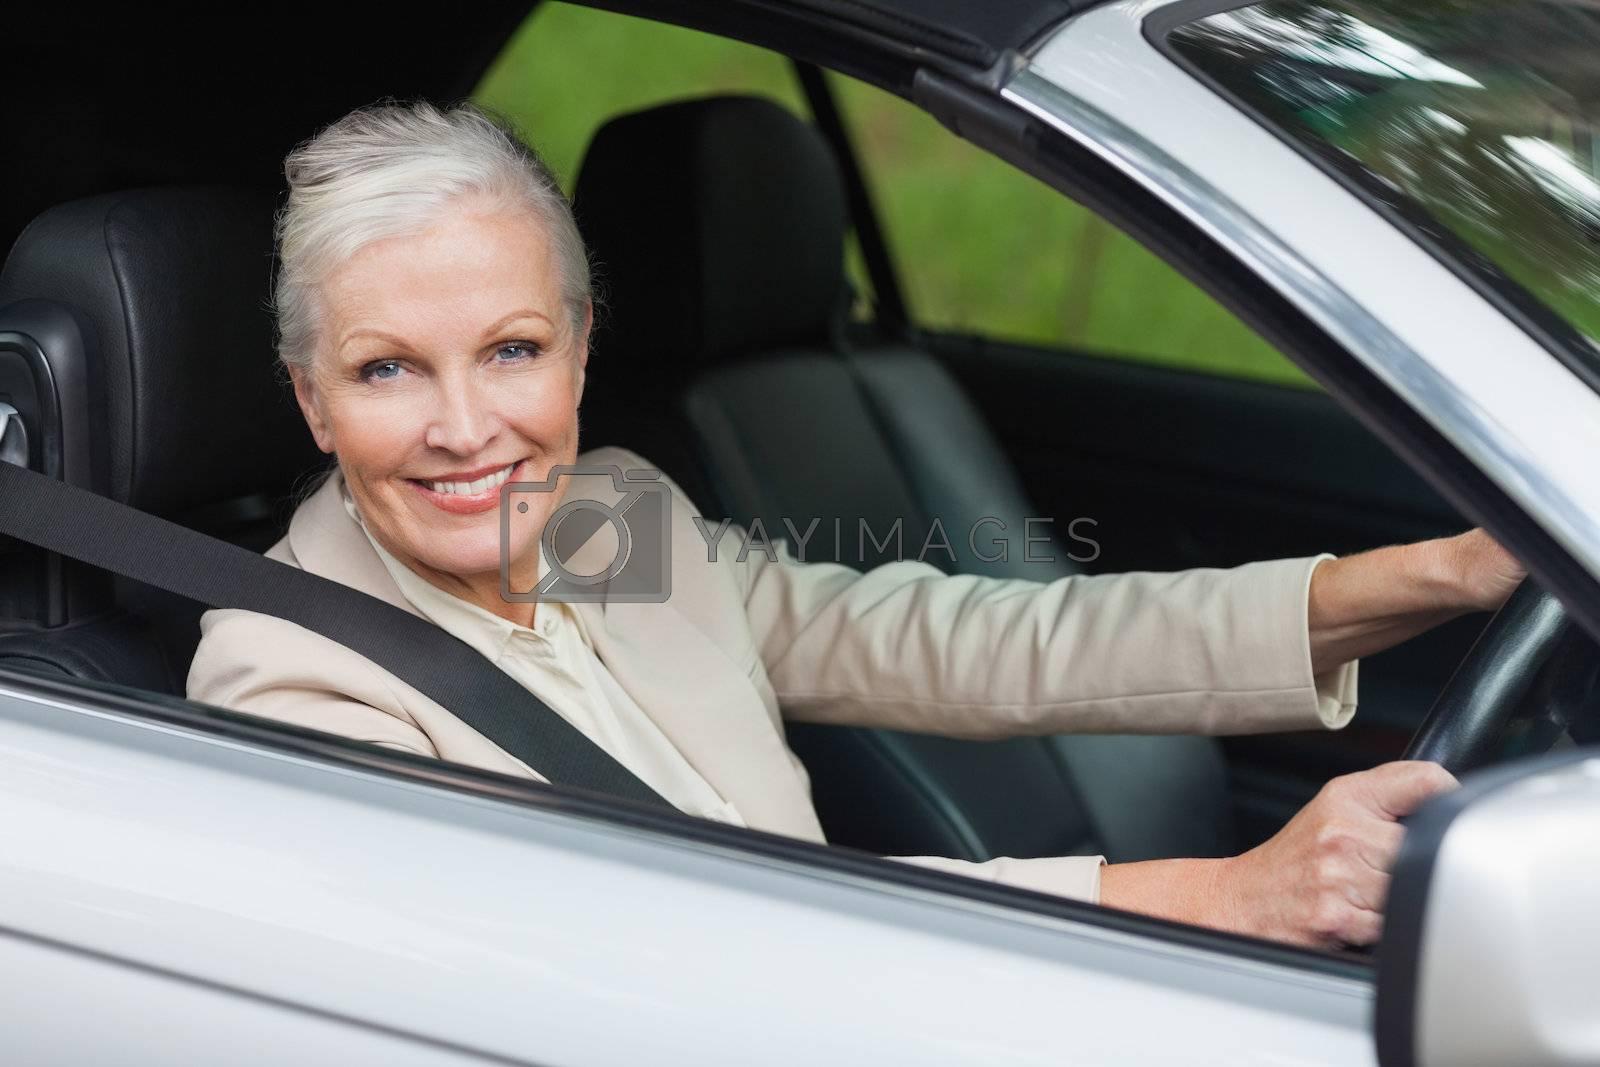 Cheerful businesswoman driving classy car by Wavebreakmedia